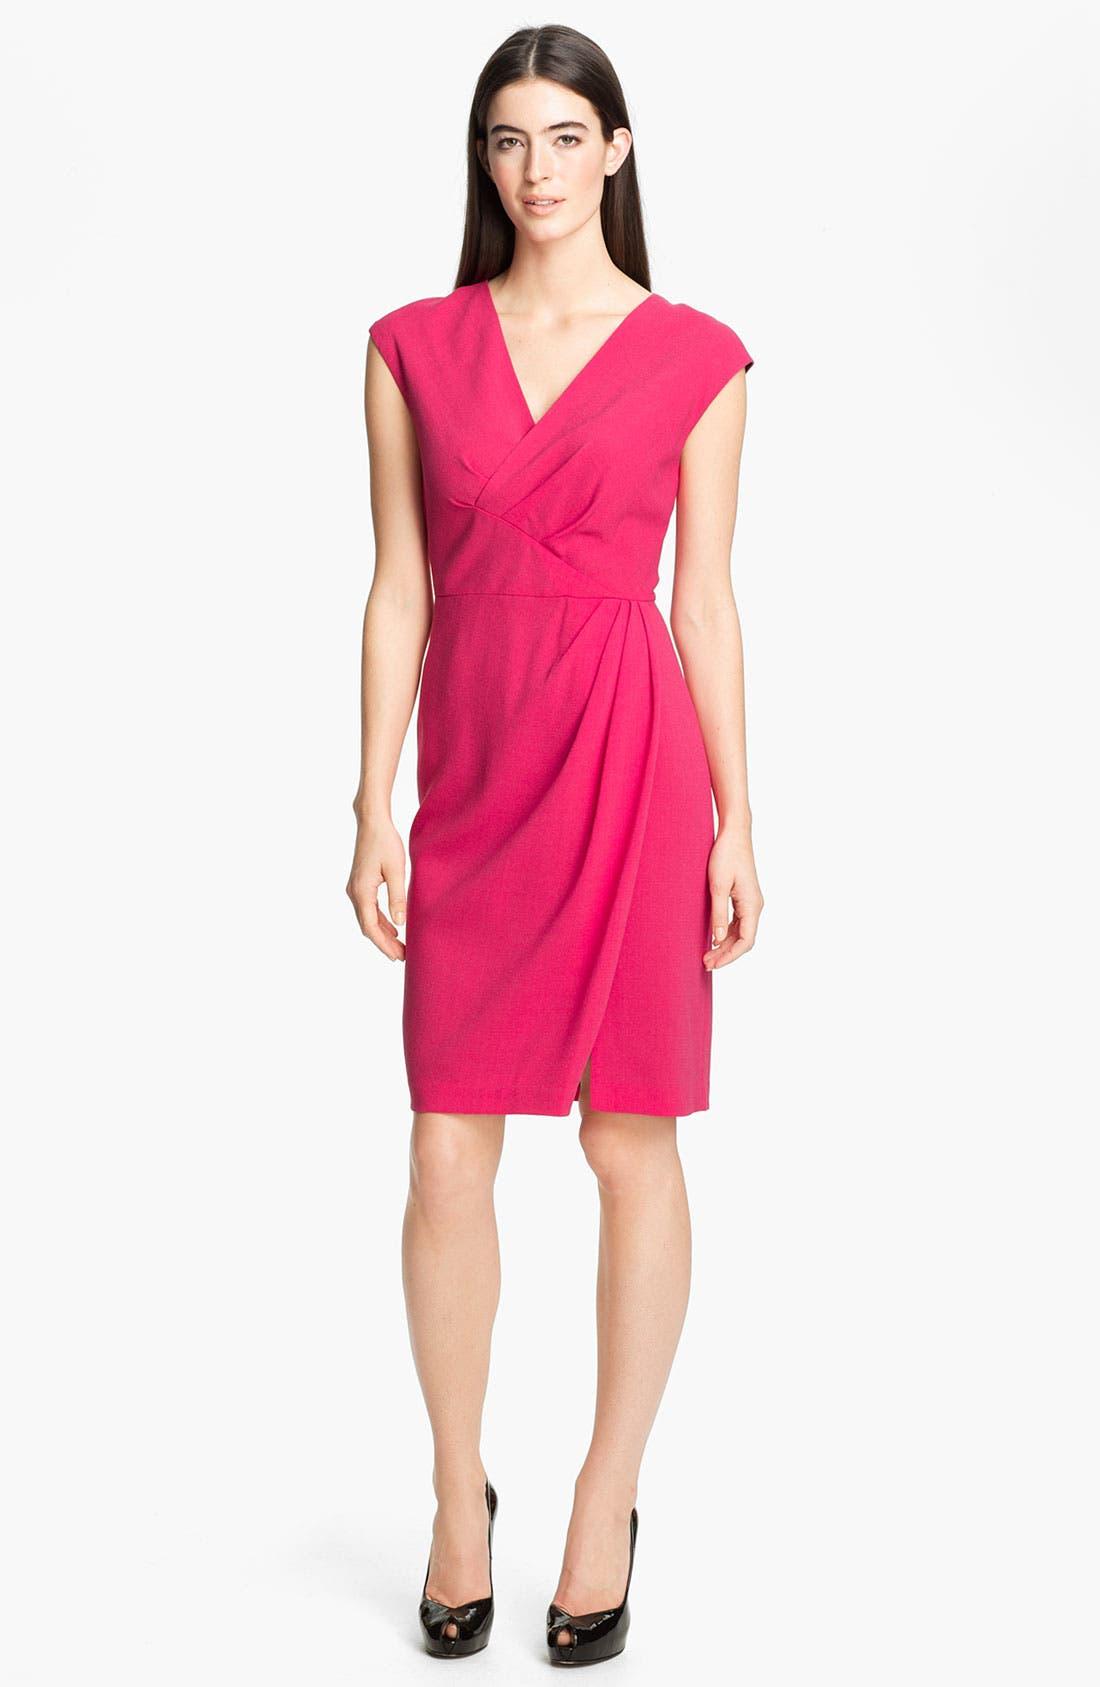 Alternate Image 1 Selected - Lafayette 148 New York 'Elsa - Astute Crepe' Dress